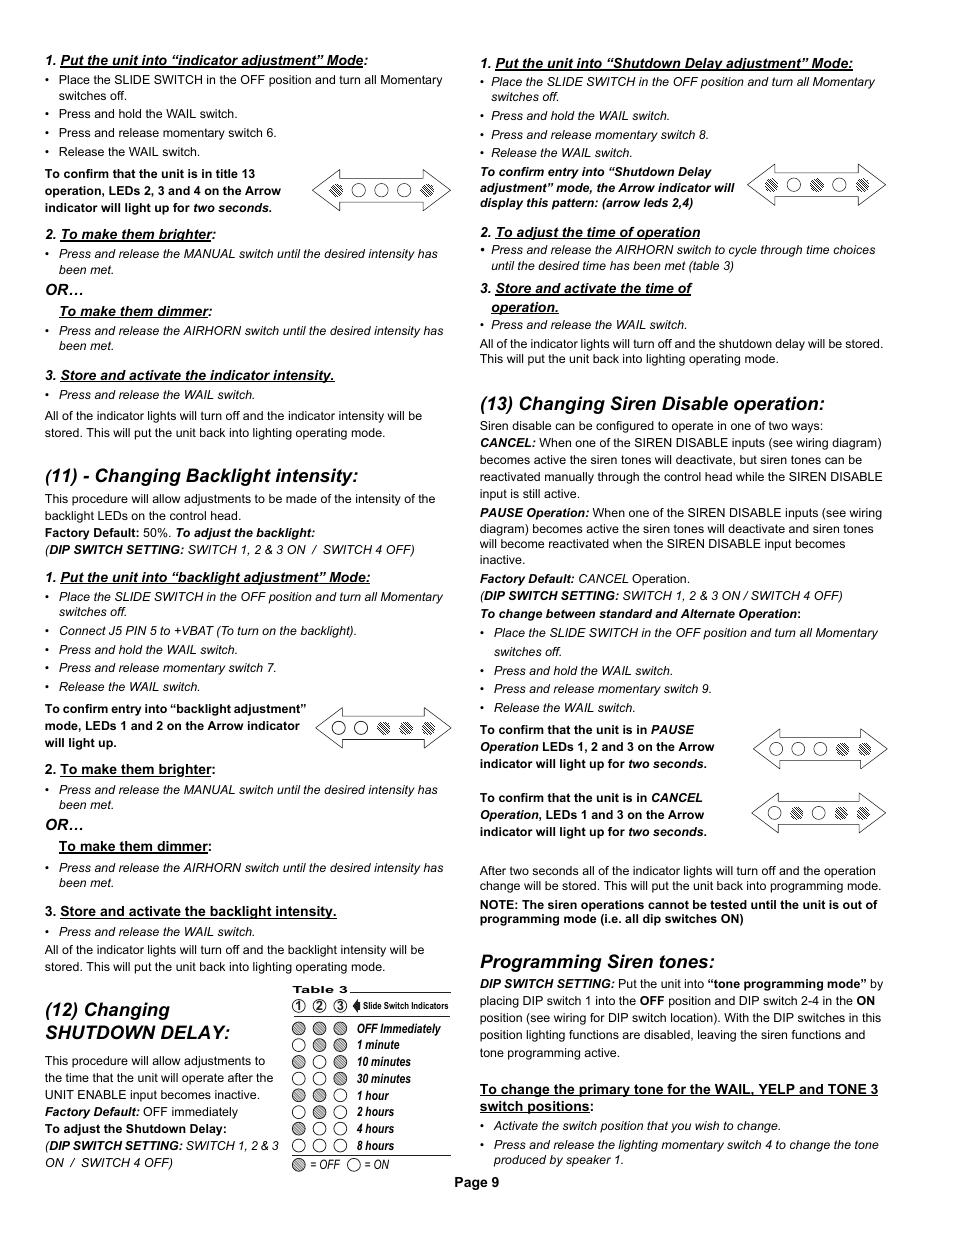 11 Changing Backlight Intensity 12 Shutdown Delay 13 Change Whelen Siren Tones Disable Operation 295sda1 User Manual Page 9 10